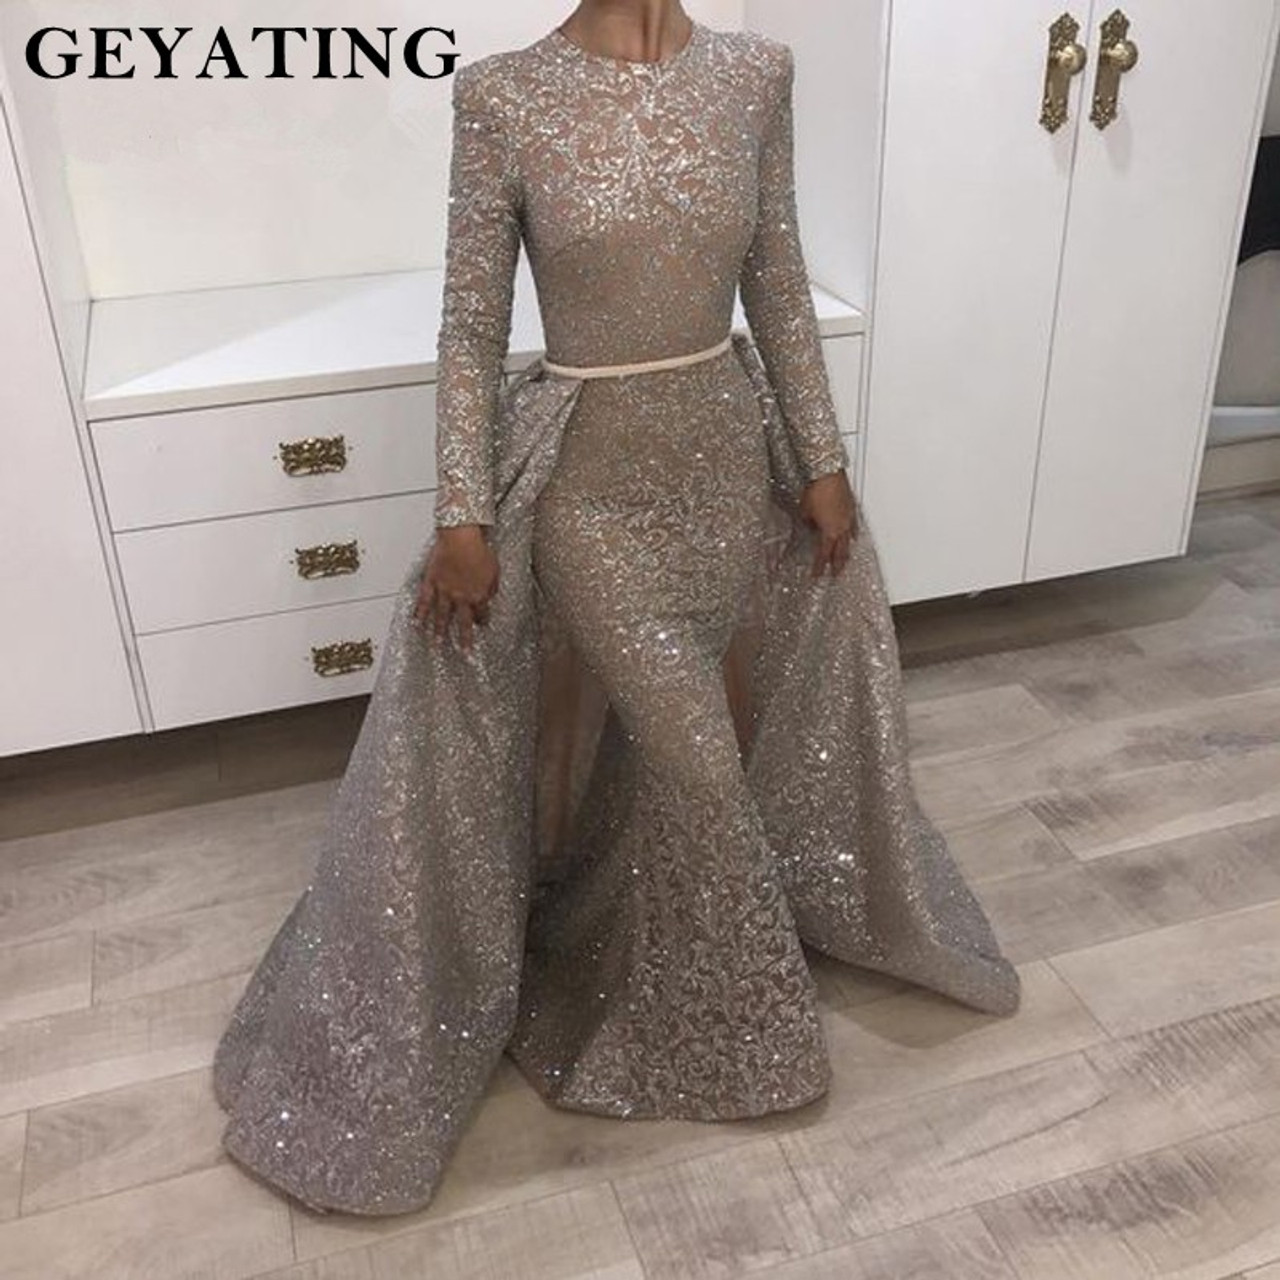 098410e4dada Yousef Aljasmi Long Sleeve Evening Dress 2018 Muslim Detachable Train Women  Formal Evening Gowns Dubai Long ...